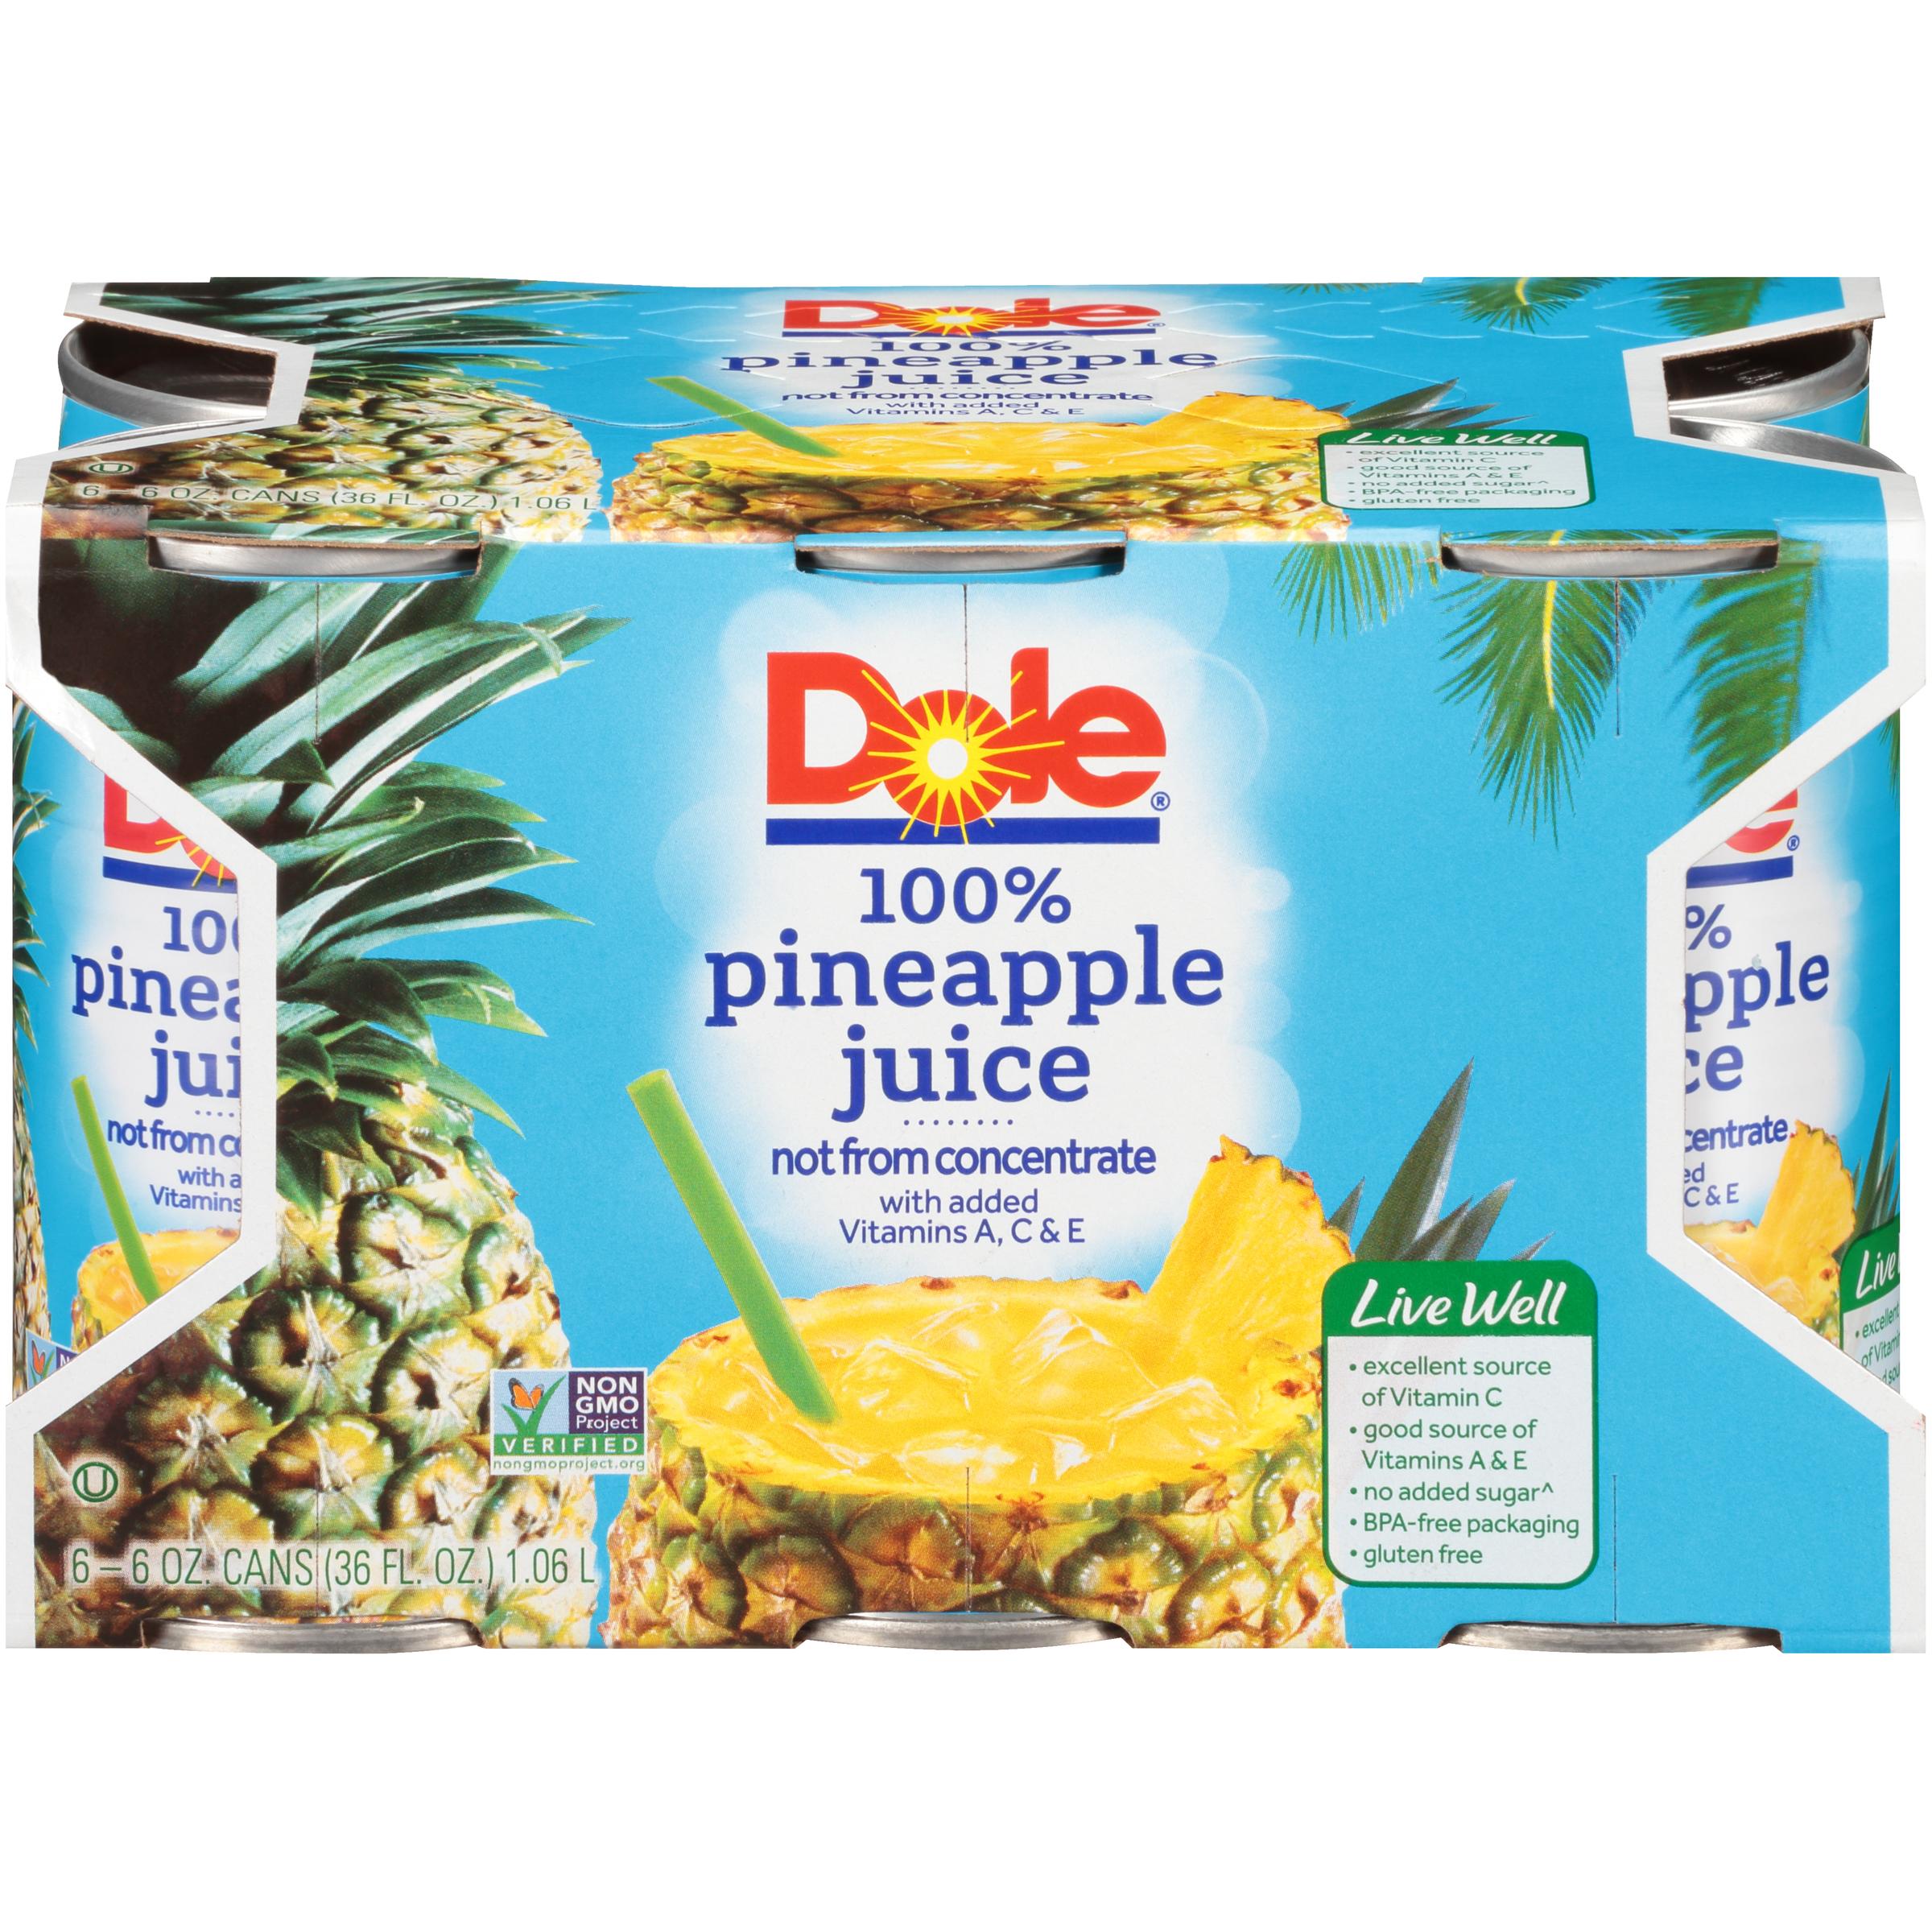 8/6 Pk/6 Oz. Pineapple Juice